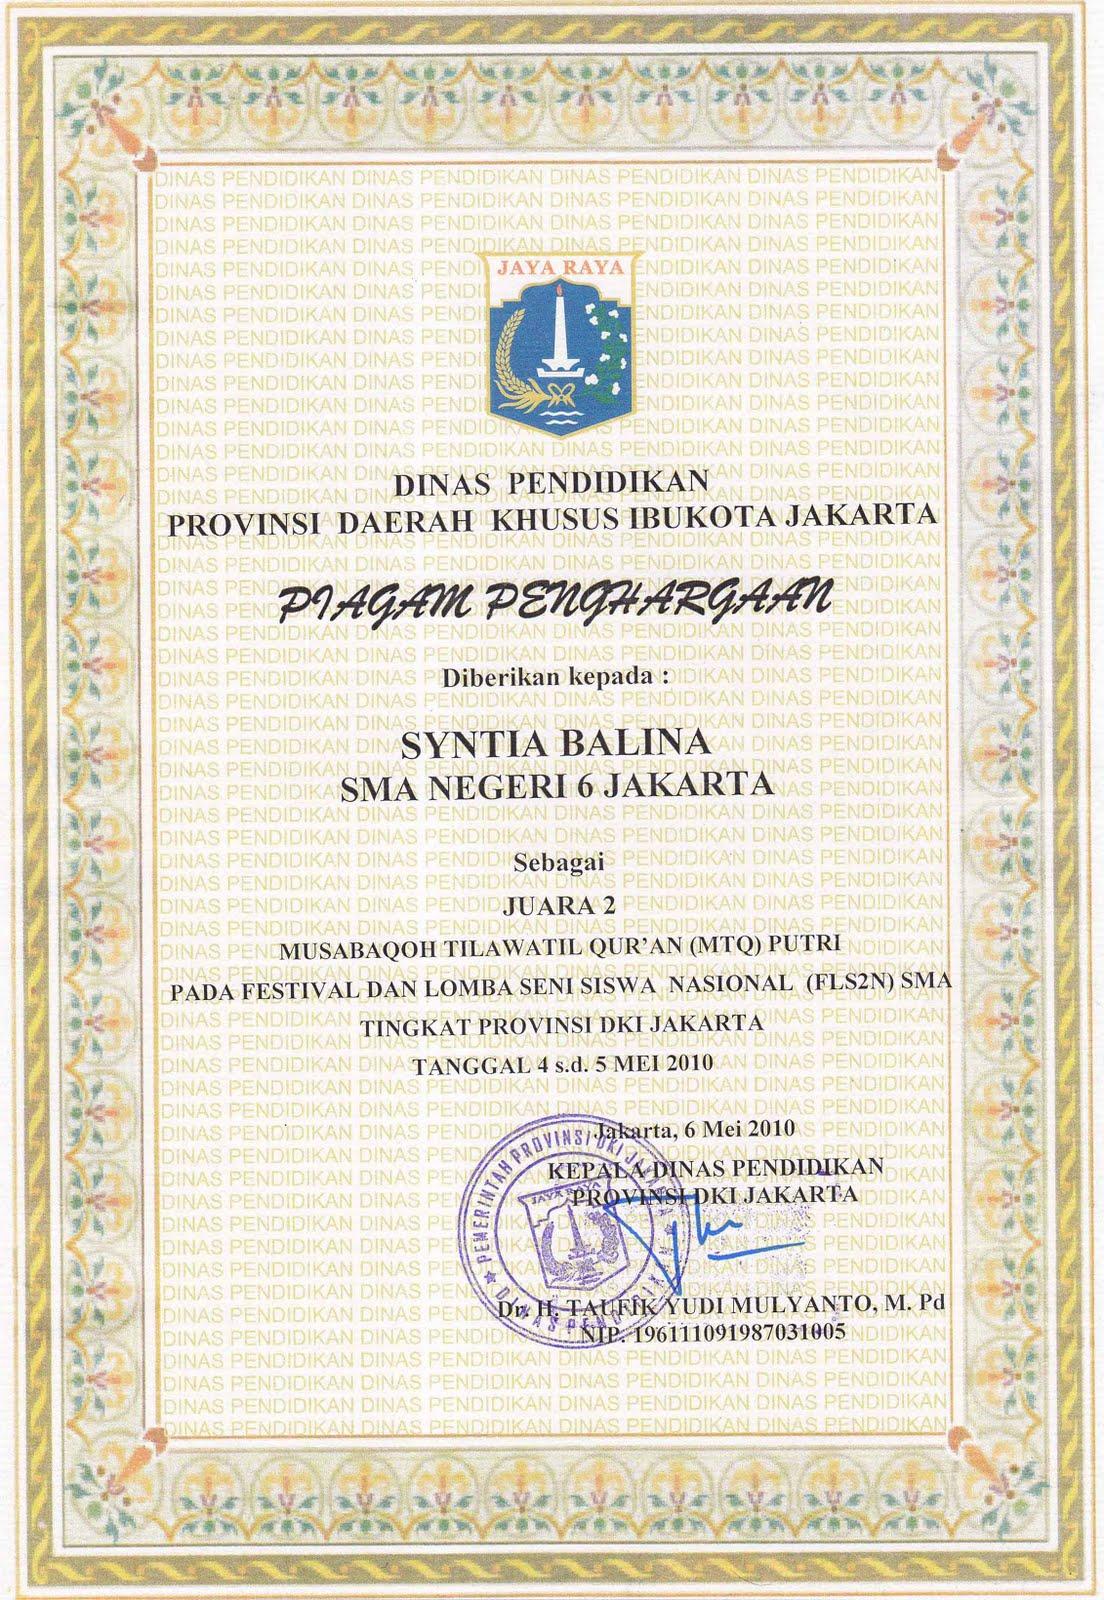 Flsn Festifal Lomba Seni Siswa Nasional Dki Jakarta Juara